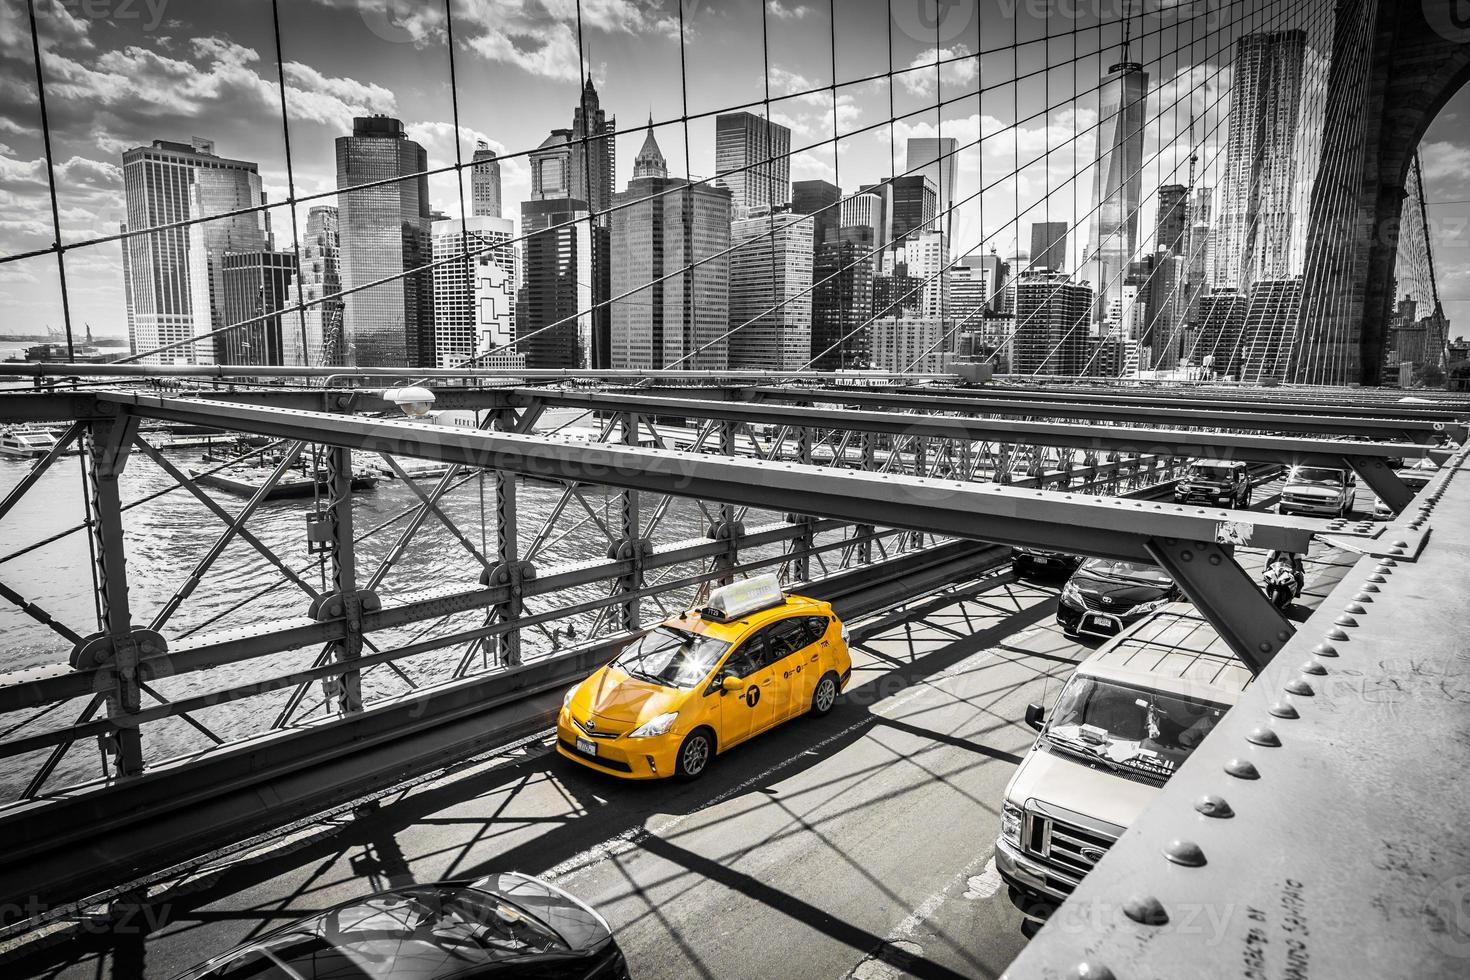 Brooklyn Bridge New York City photo